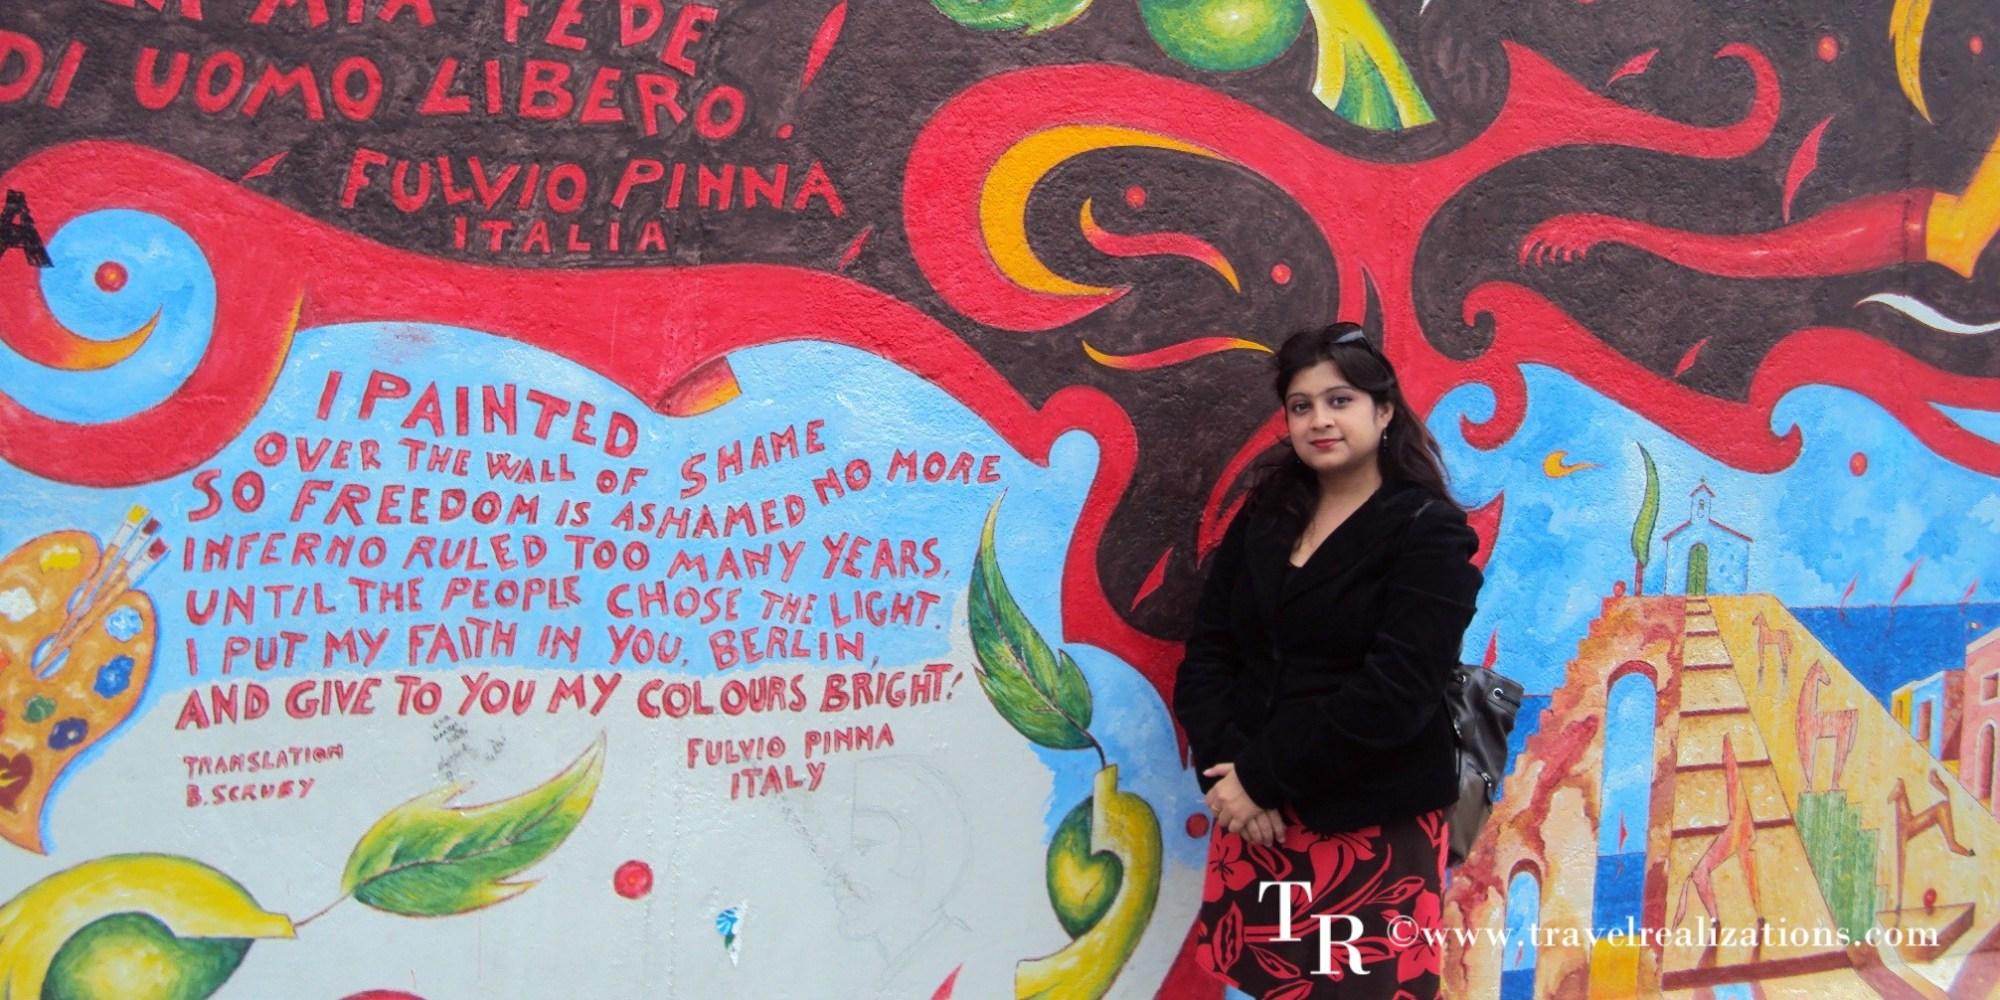 The Berlin Wall!